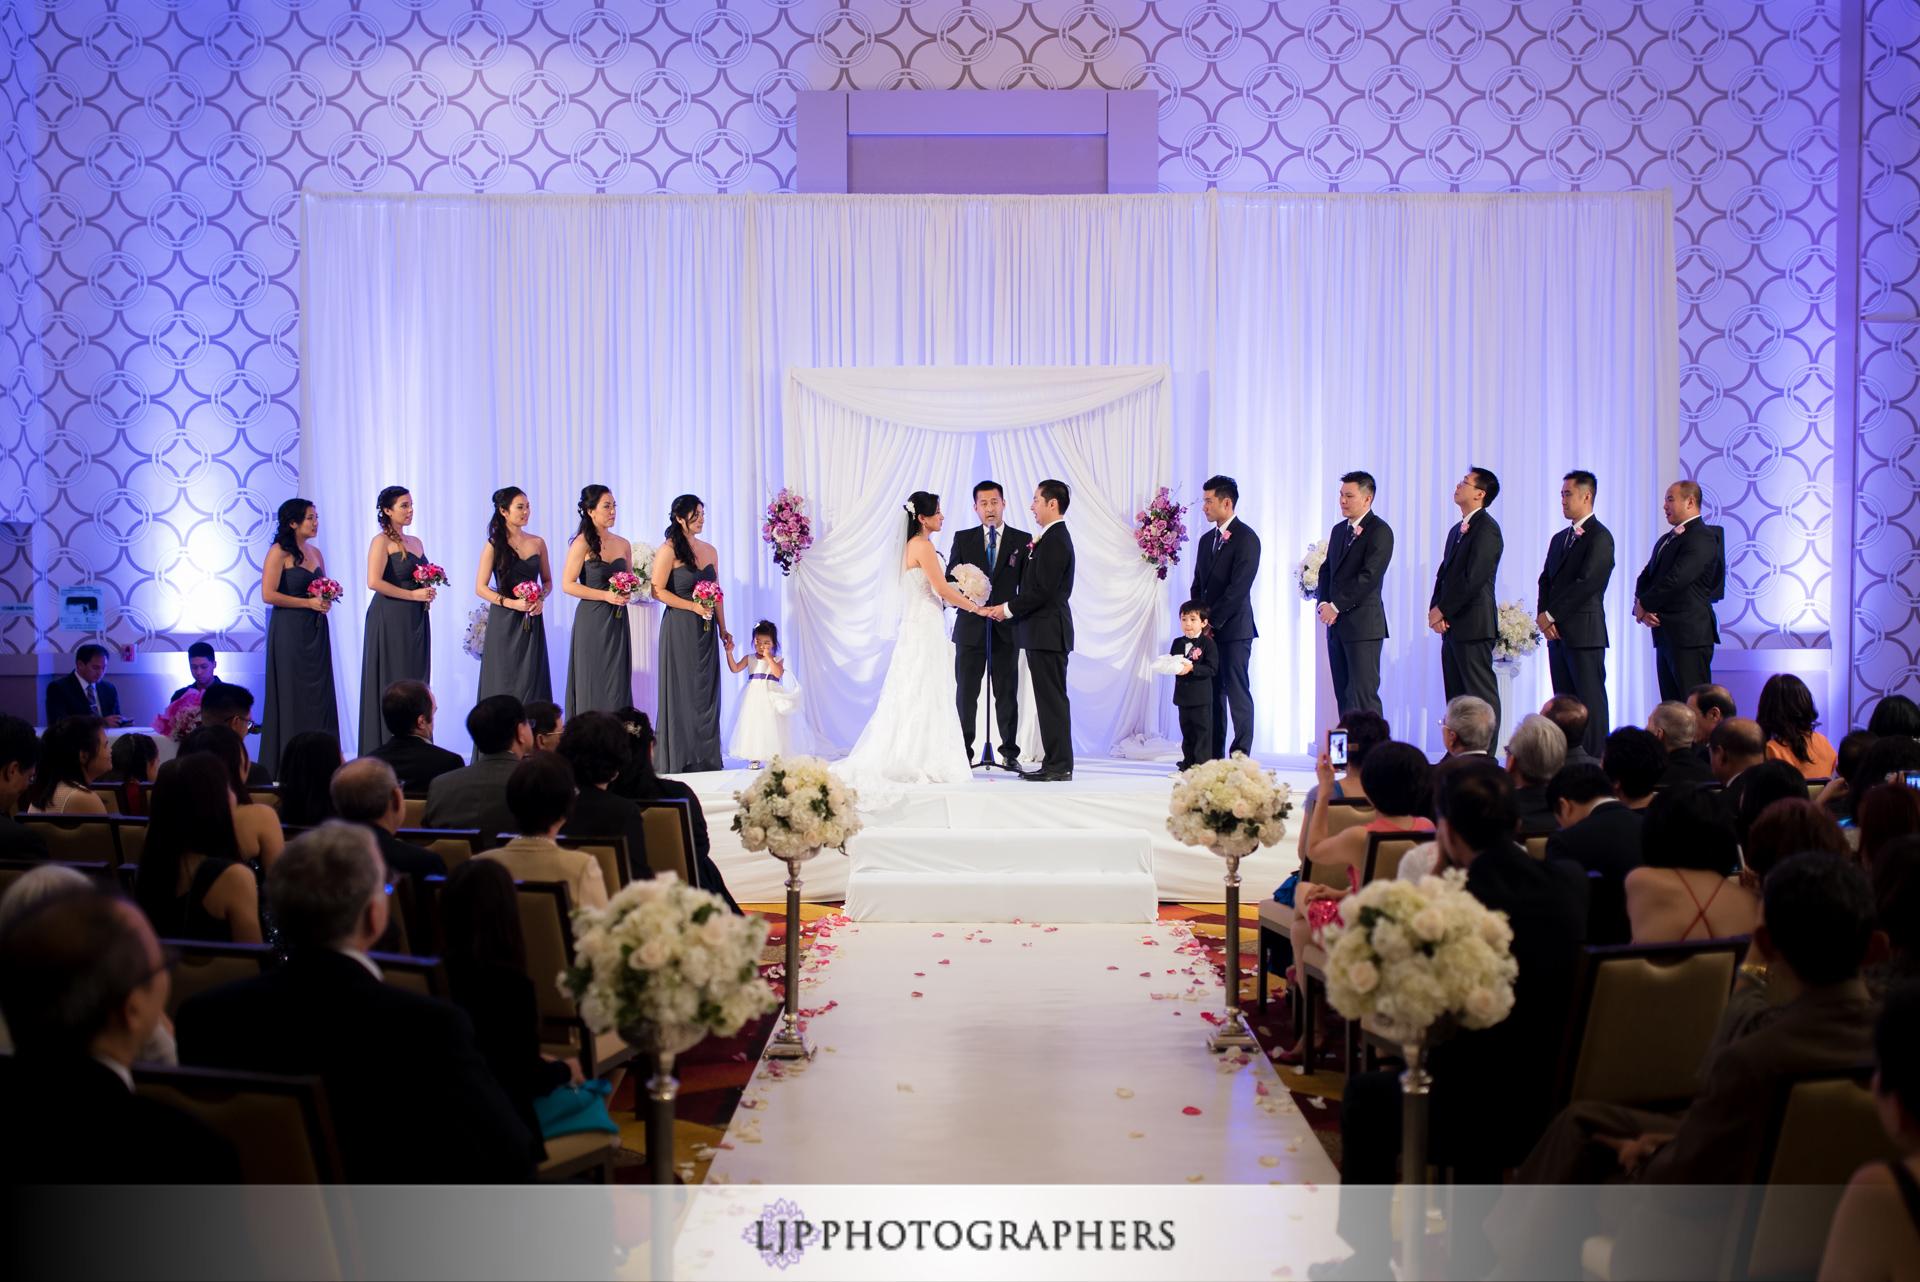 18-jw-marriott-los-angeles-wedding-photographer-wedding-ceremony-photos